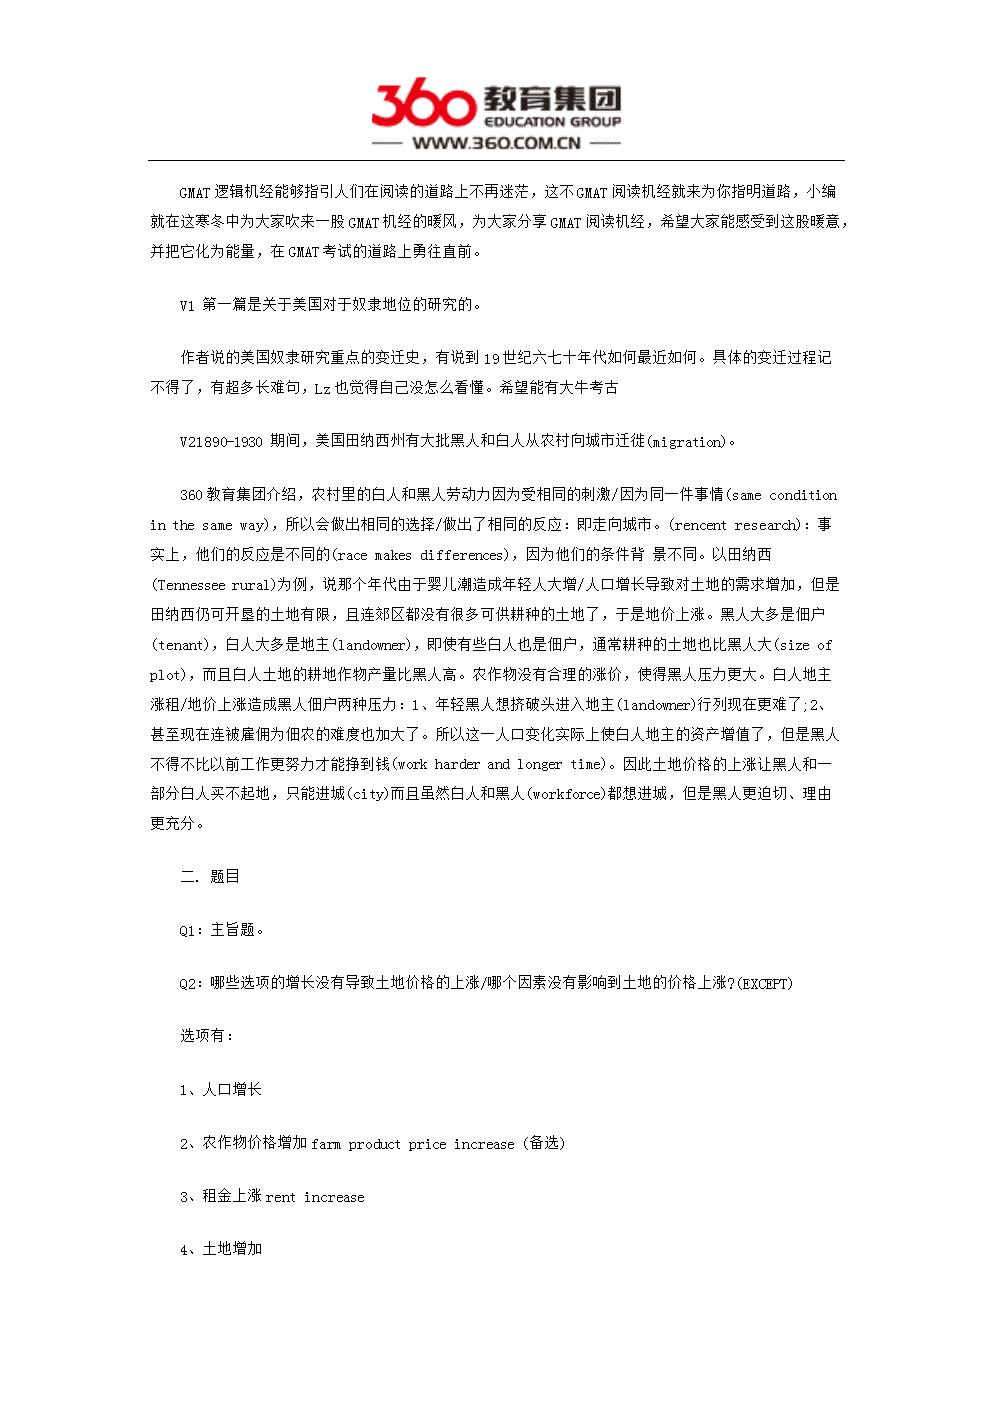 GMAT黑人白人移民潮考题.docx